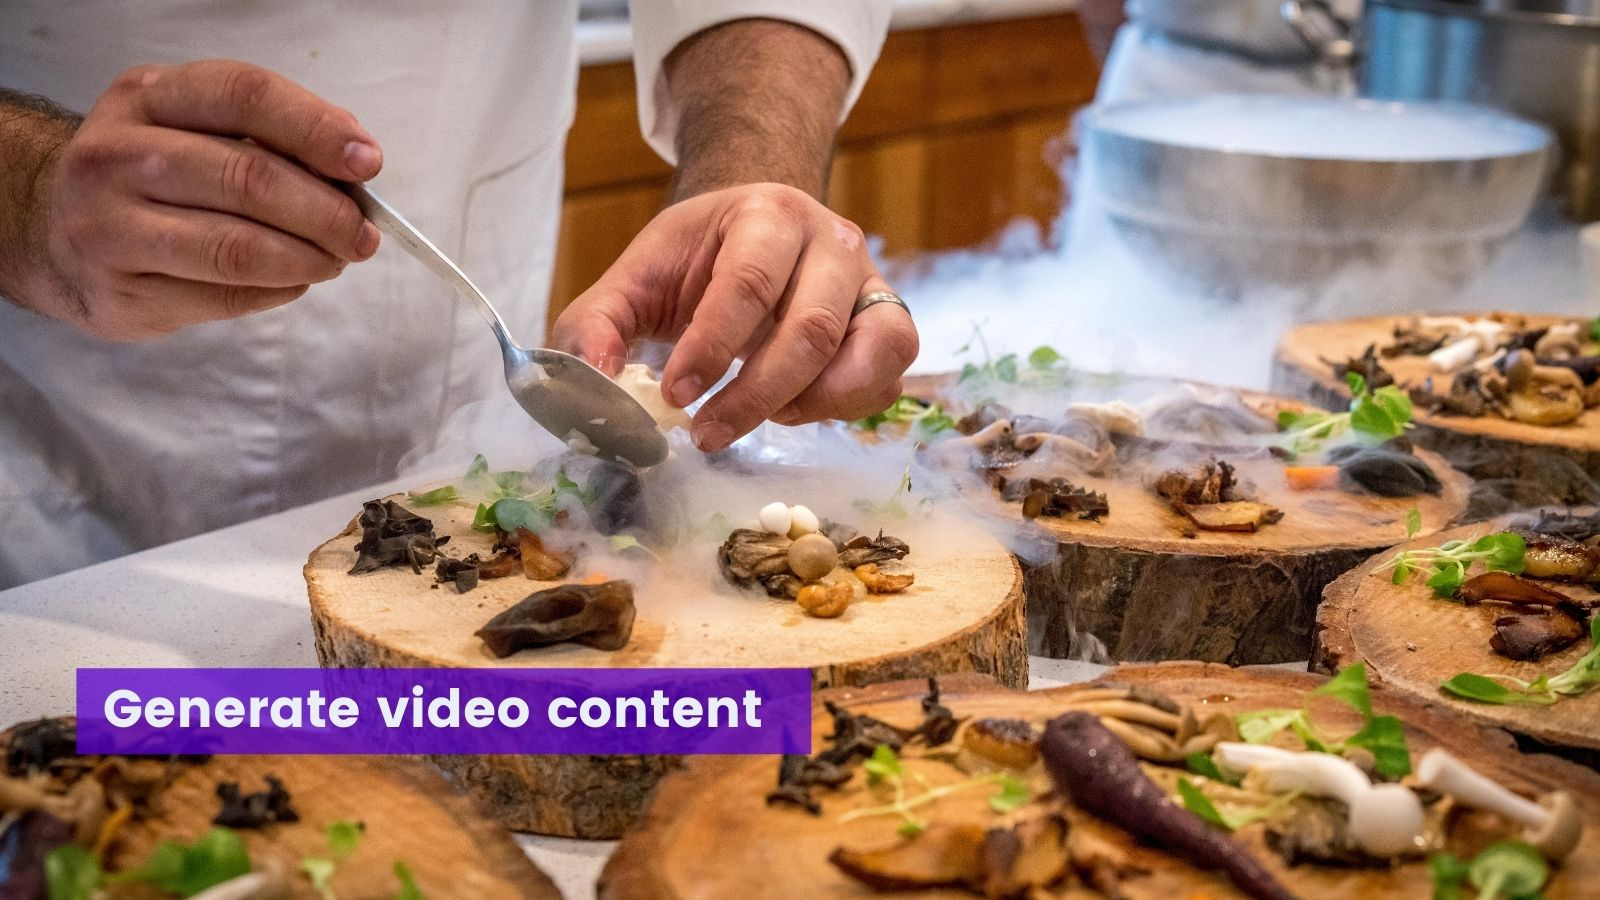 Chef creating dish on agilitycms.com